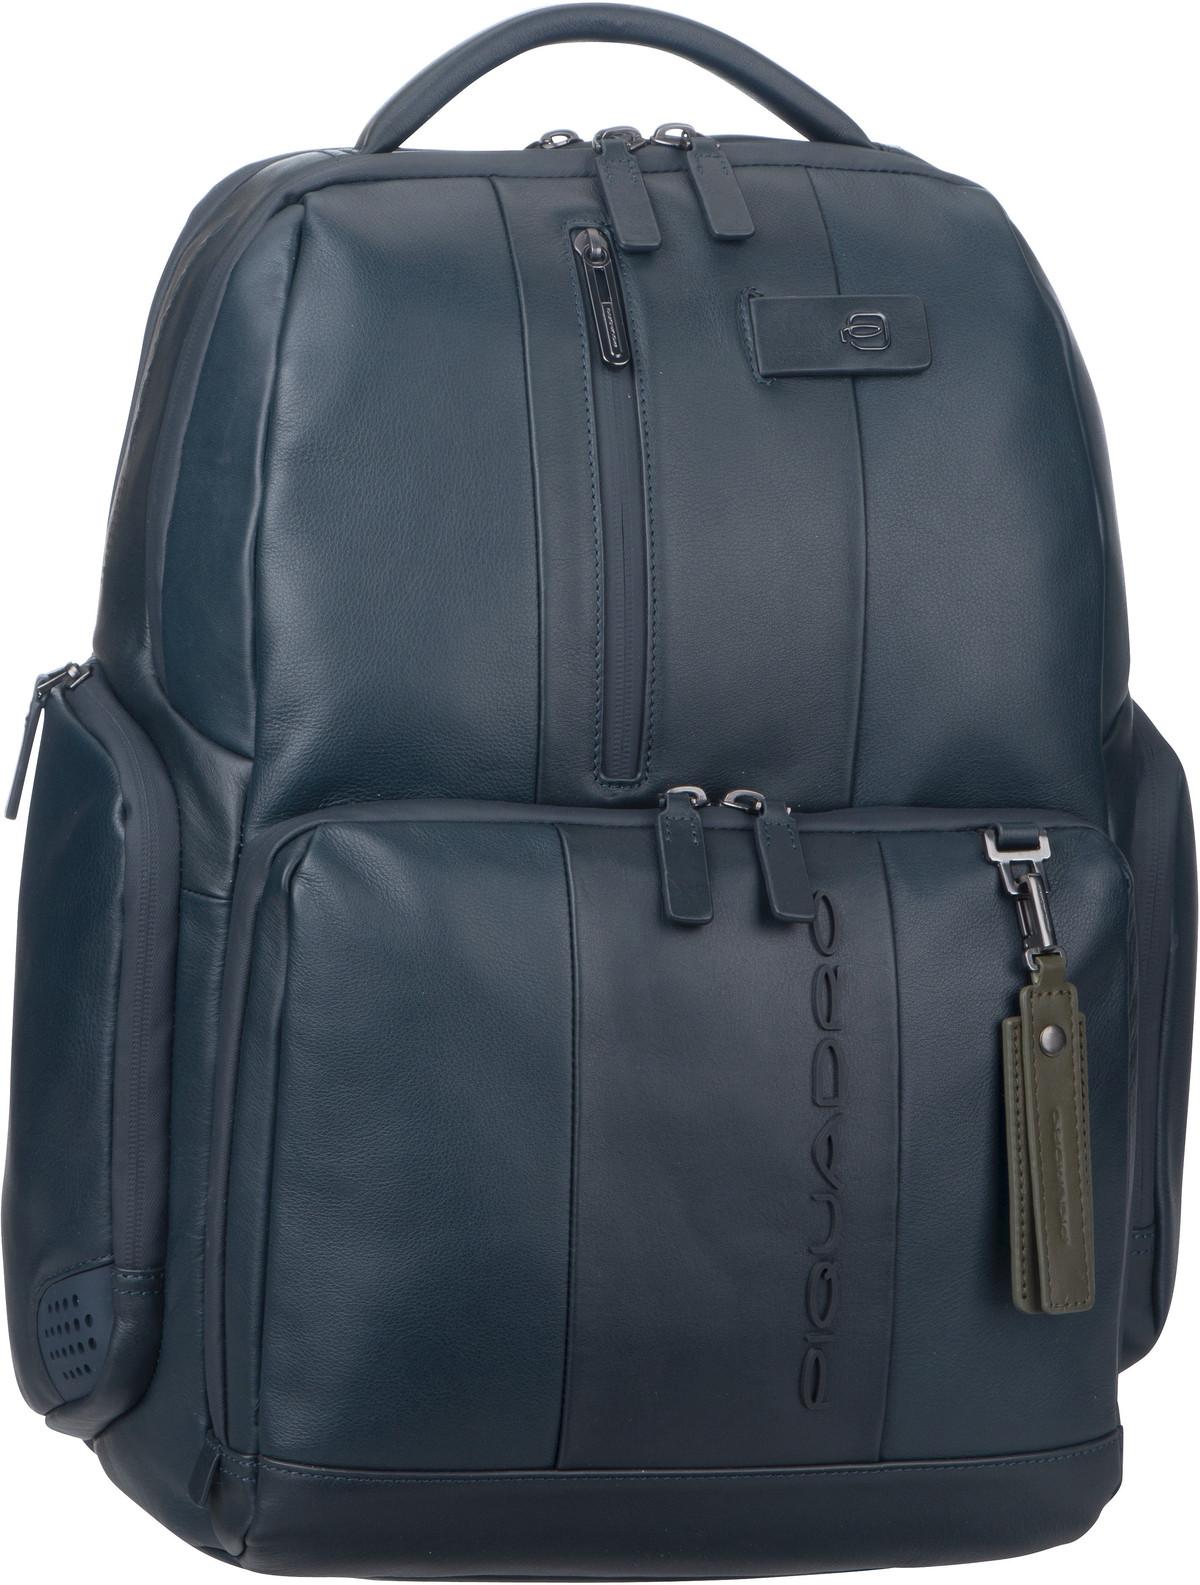 Rucksack / Daypack Urban 4532 Connequ RFID Blu (29 Liter)